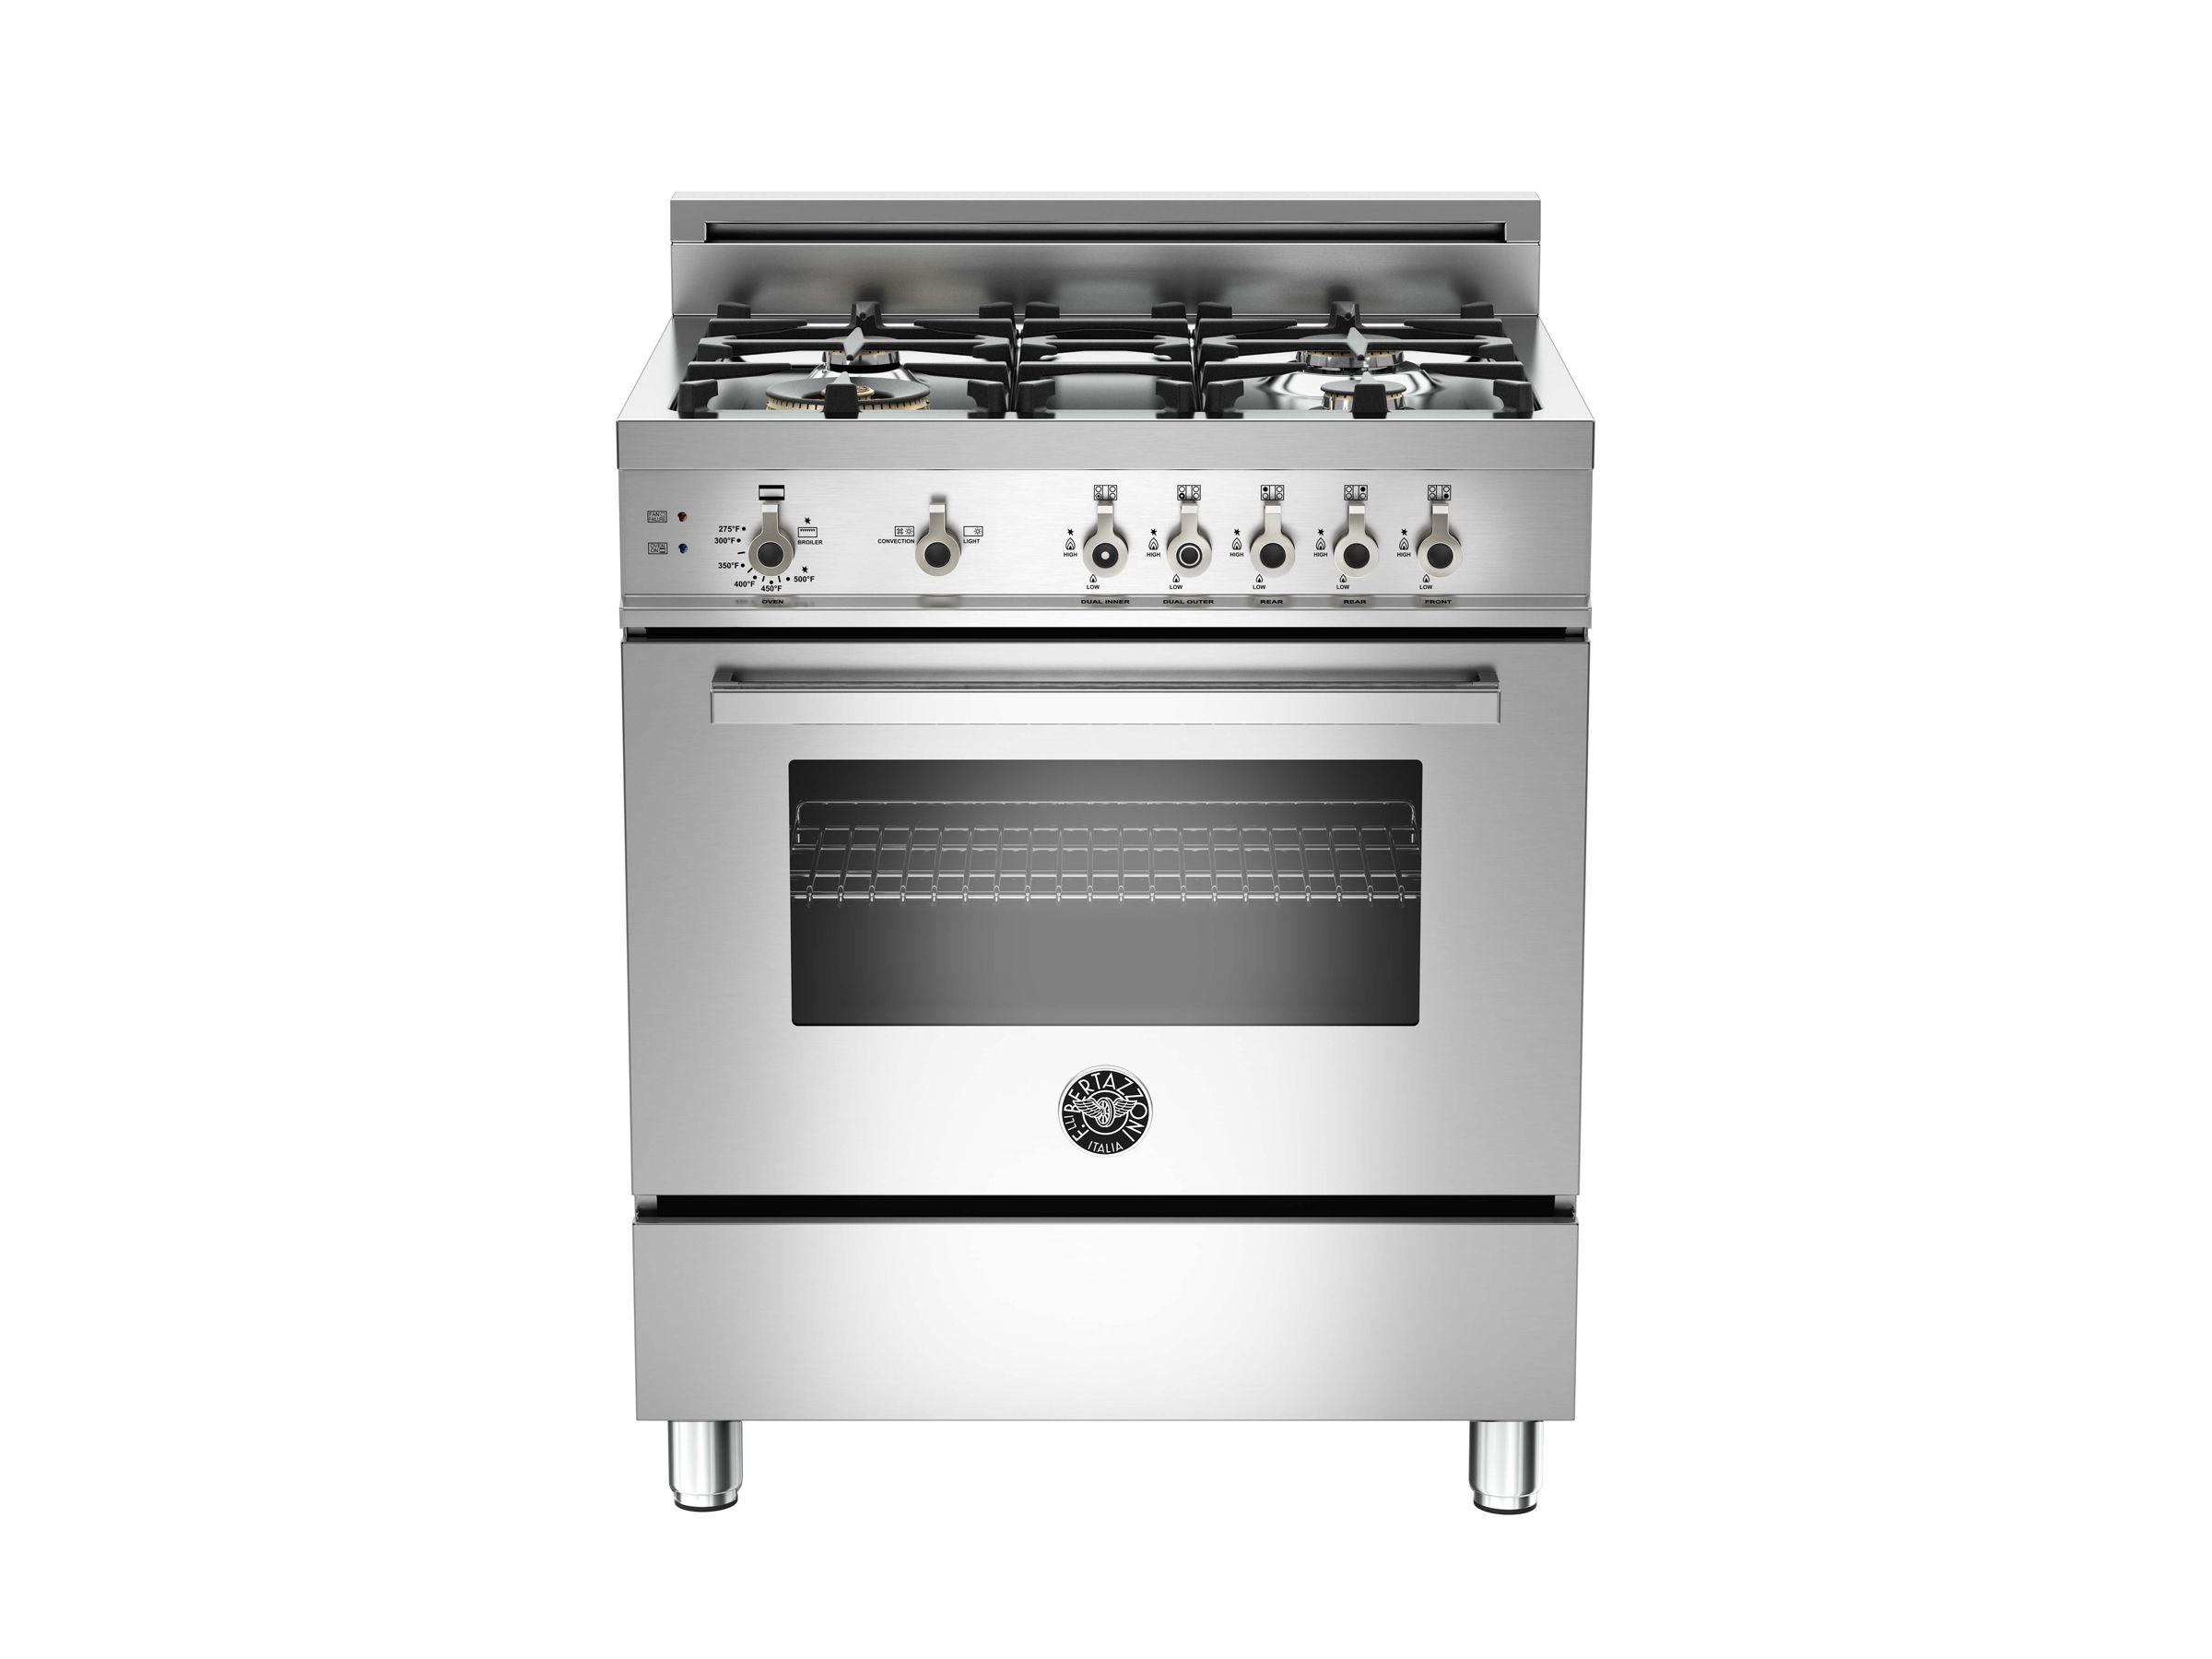 30 4-Burner, Gas Oven | Bertazzoni - Stainless | Appliance ideas ...